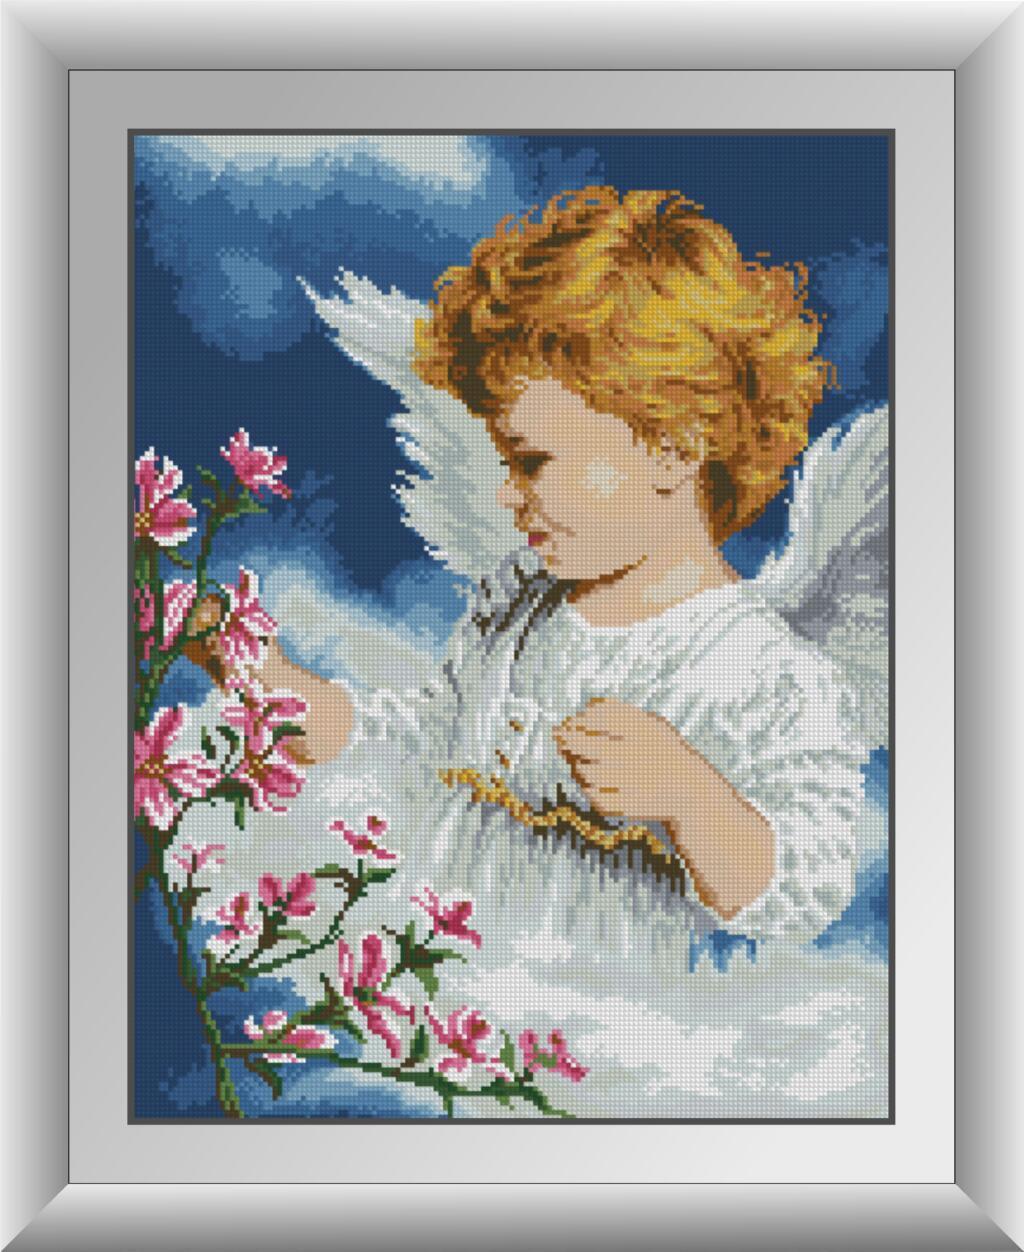 30378 Набір алмазної мозаїки Ангел з квітами